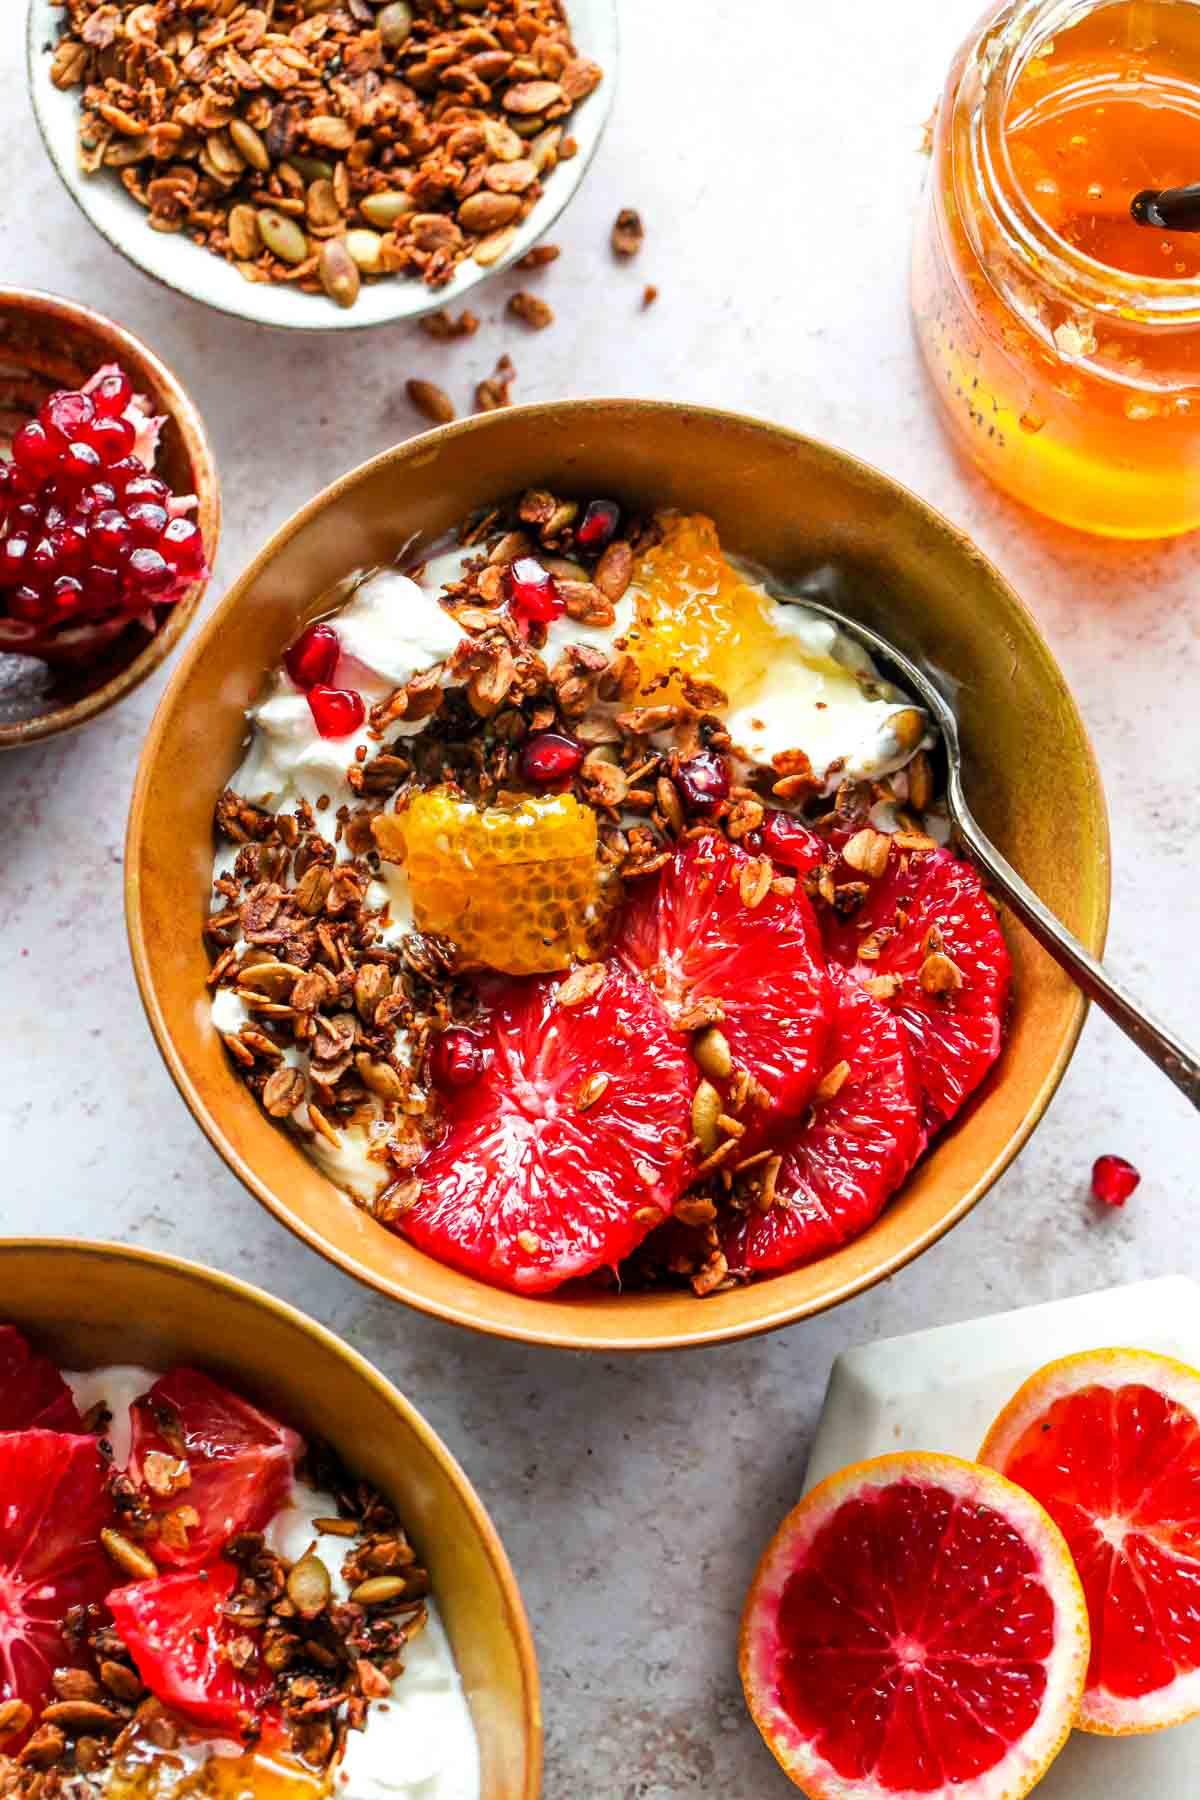 Yogurt bowl topped with citrus wedges, granola, and honey